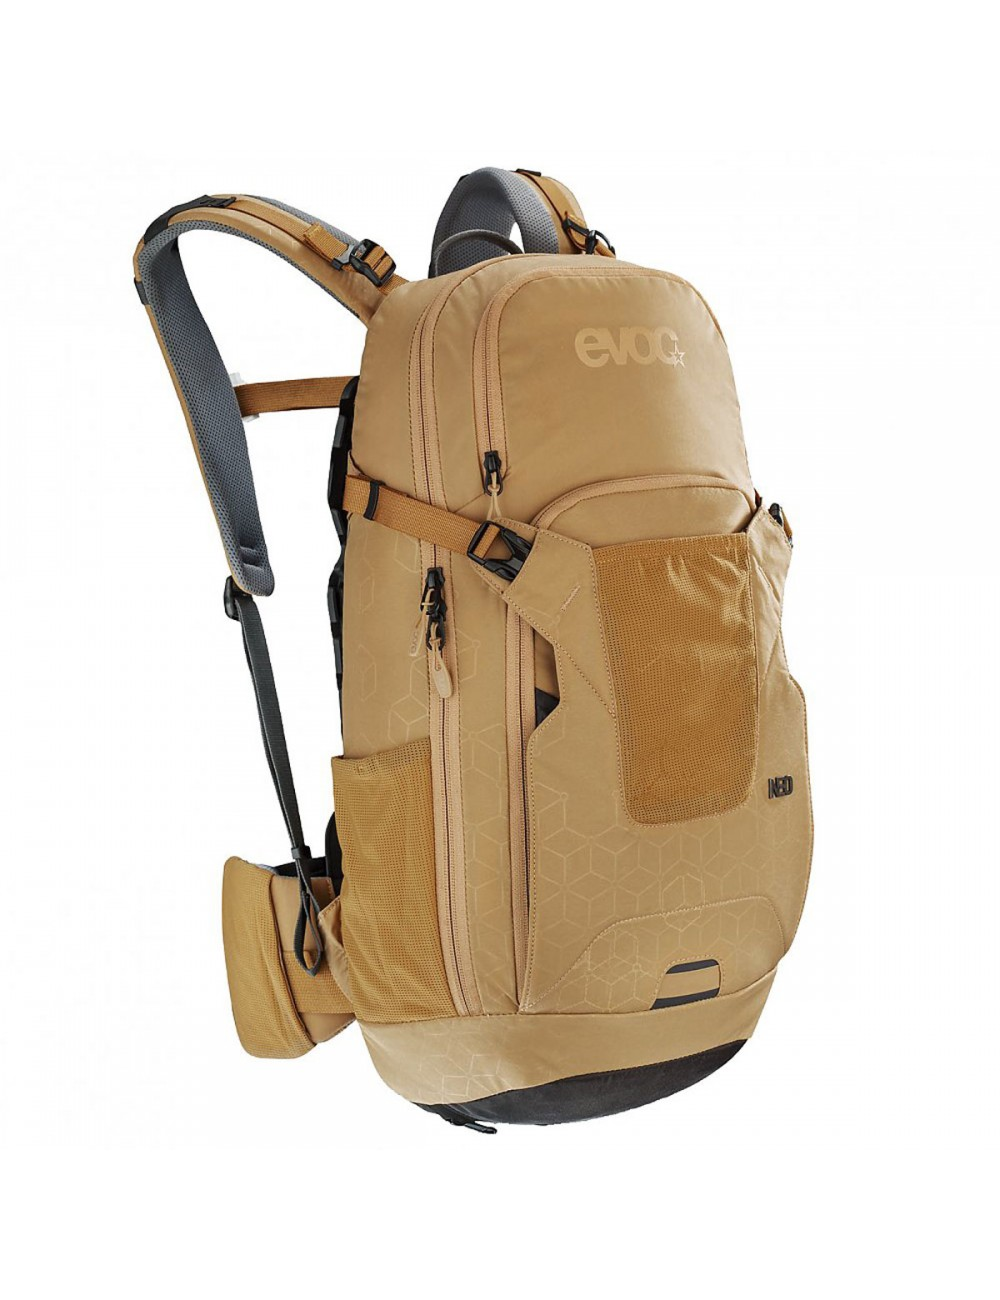 Evoc Neo 16L Backpack_11747